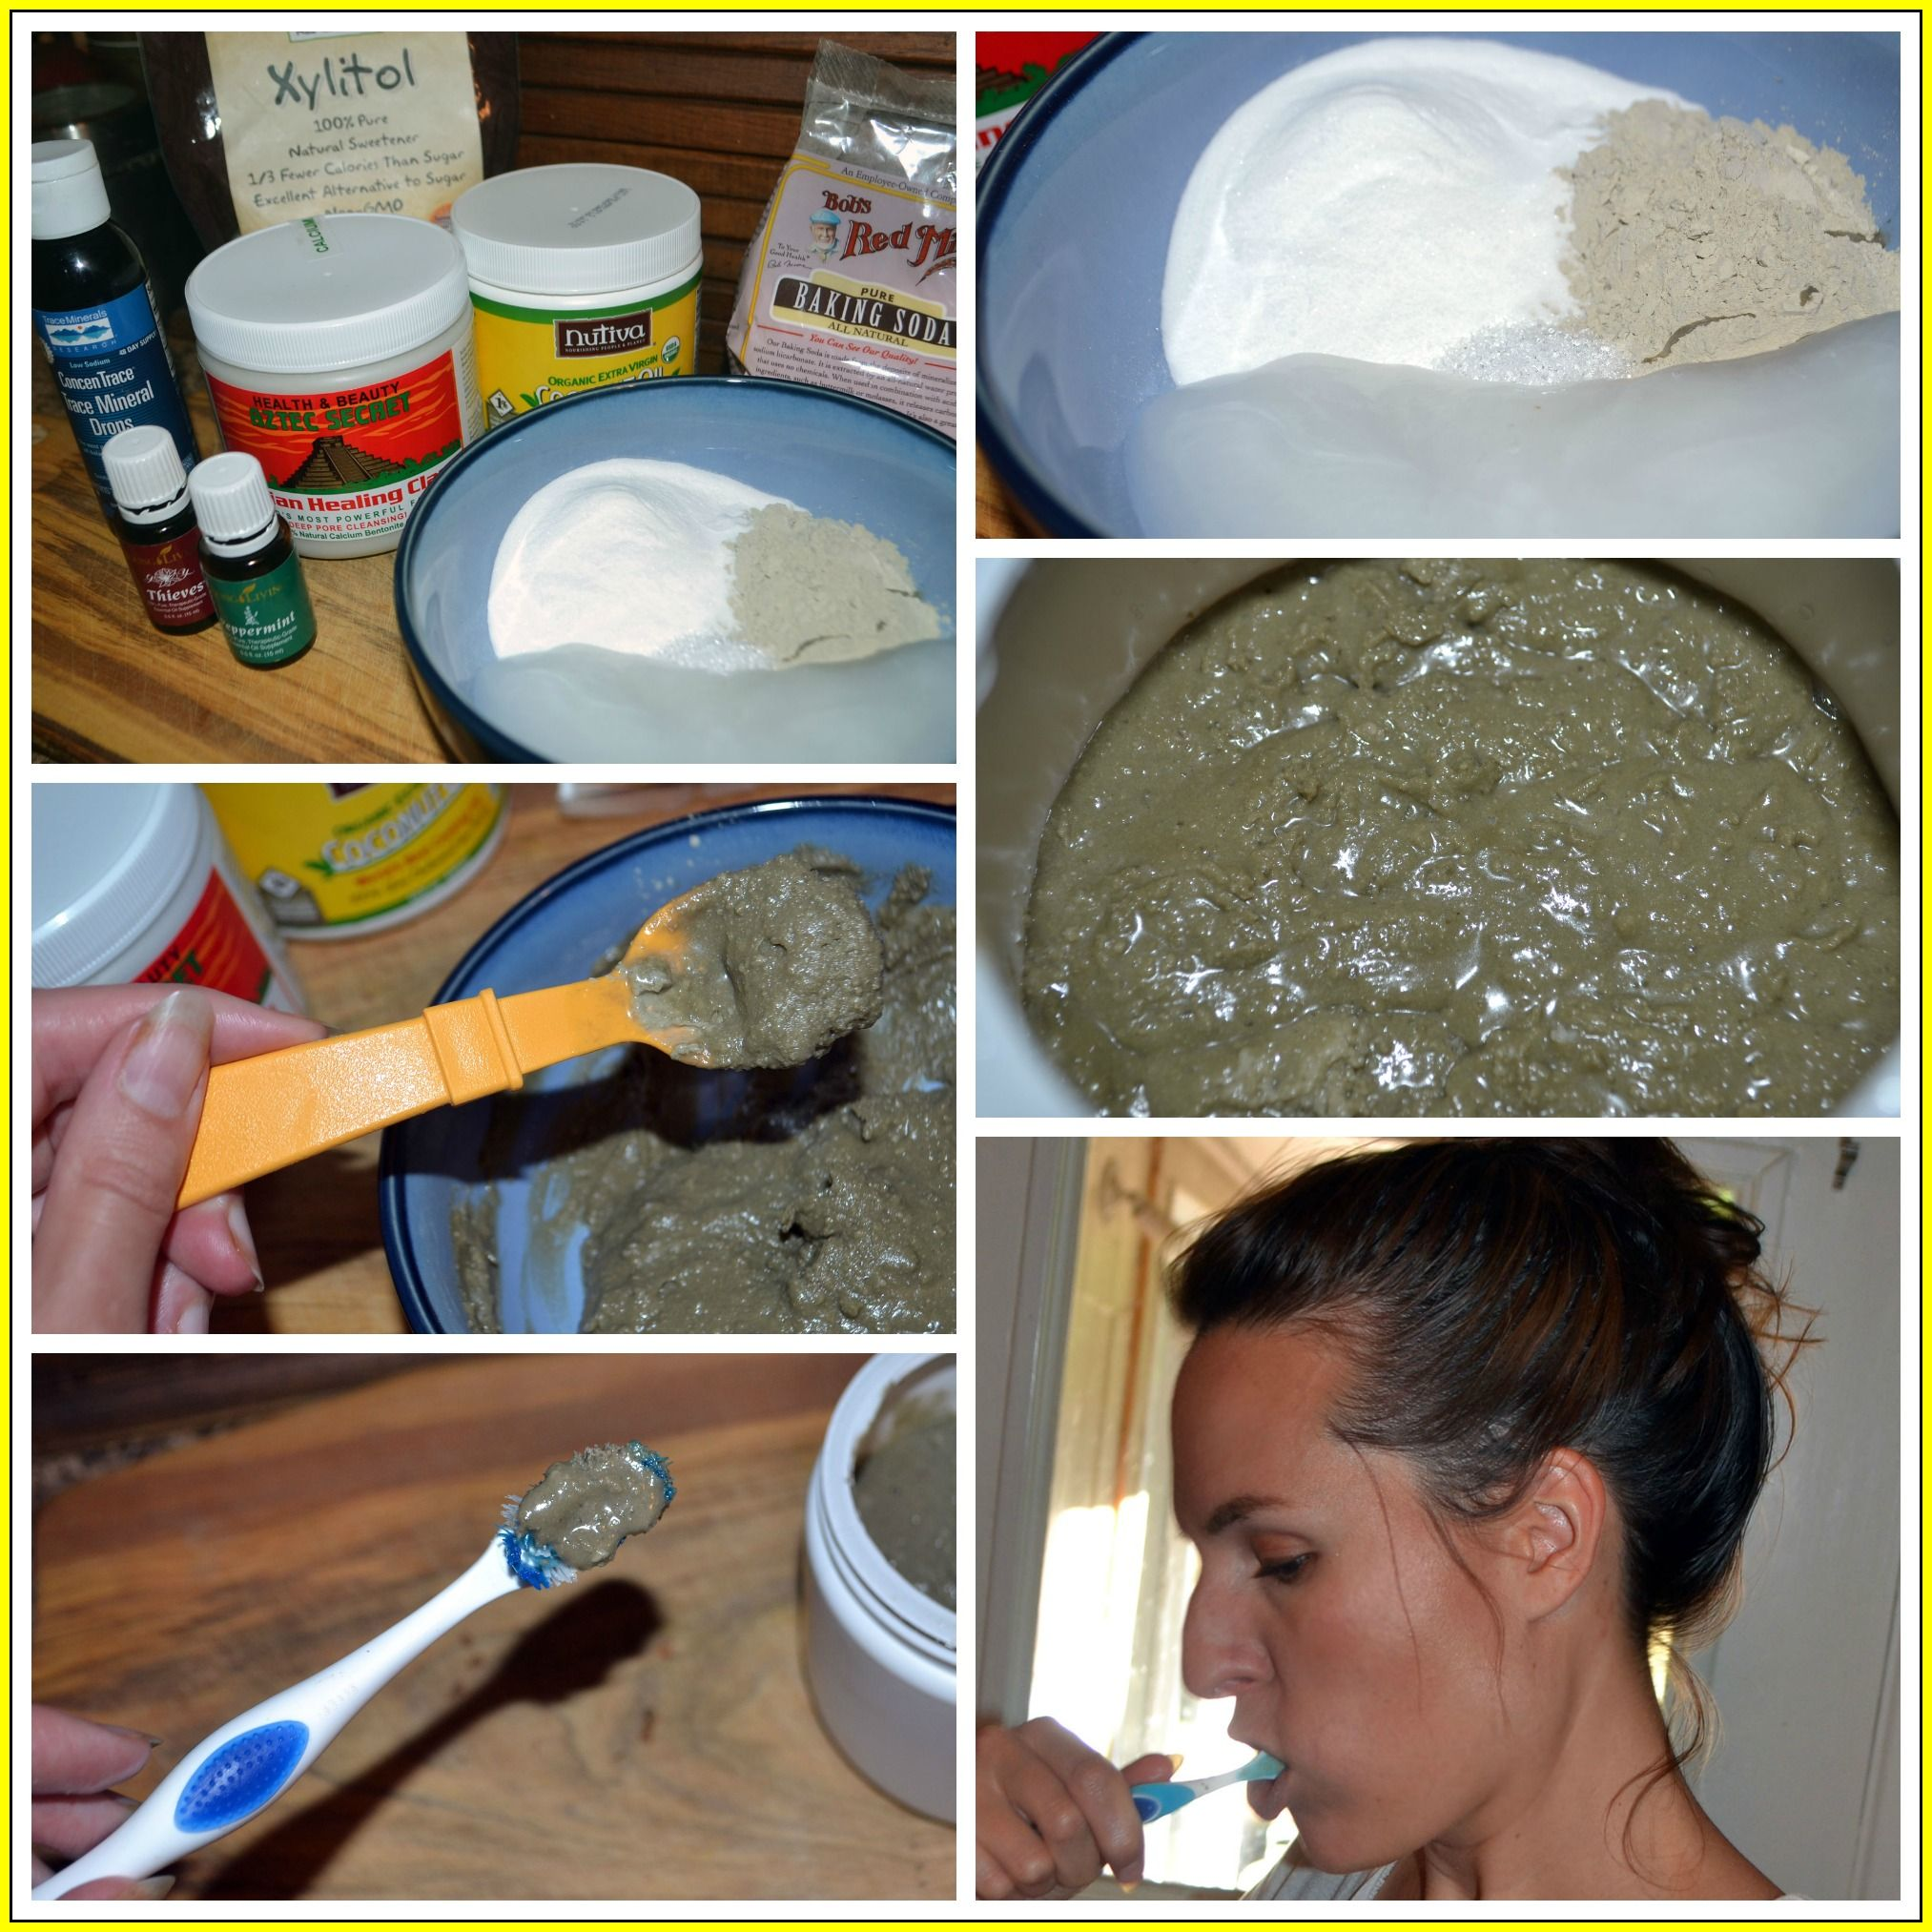 Homemade Toothpaste With Bentonite Clay  Συνταγή